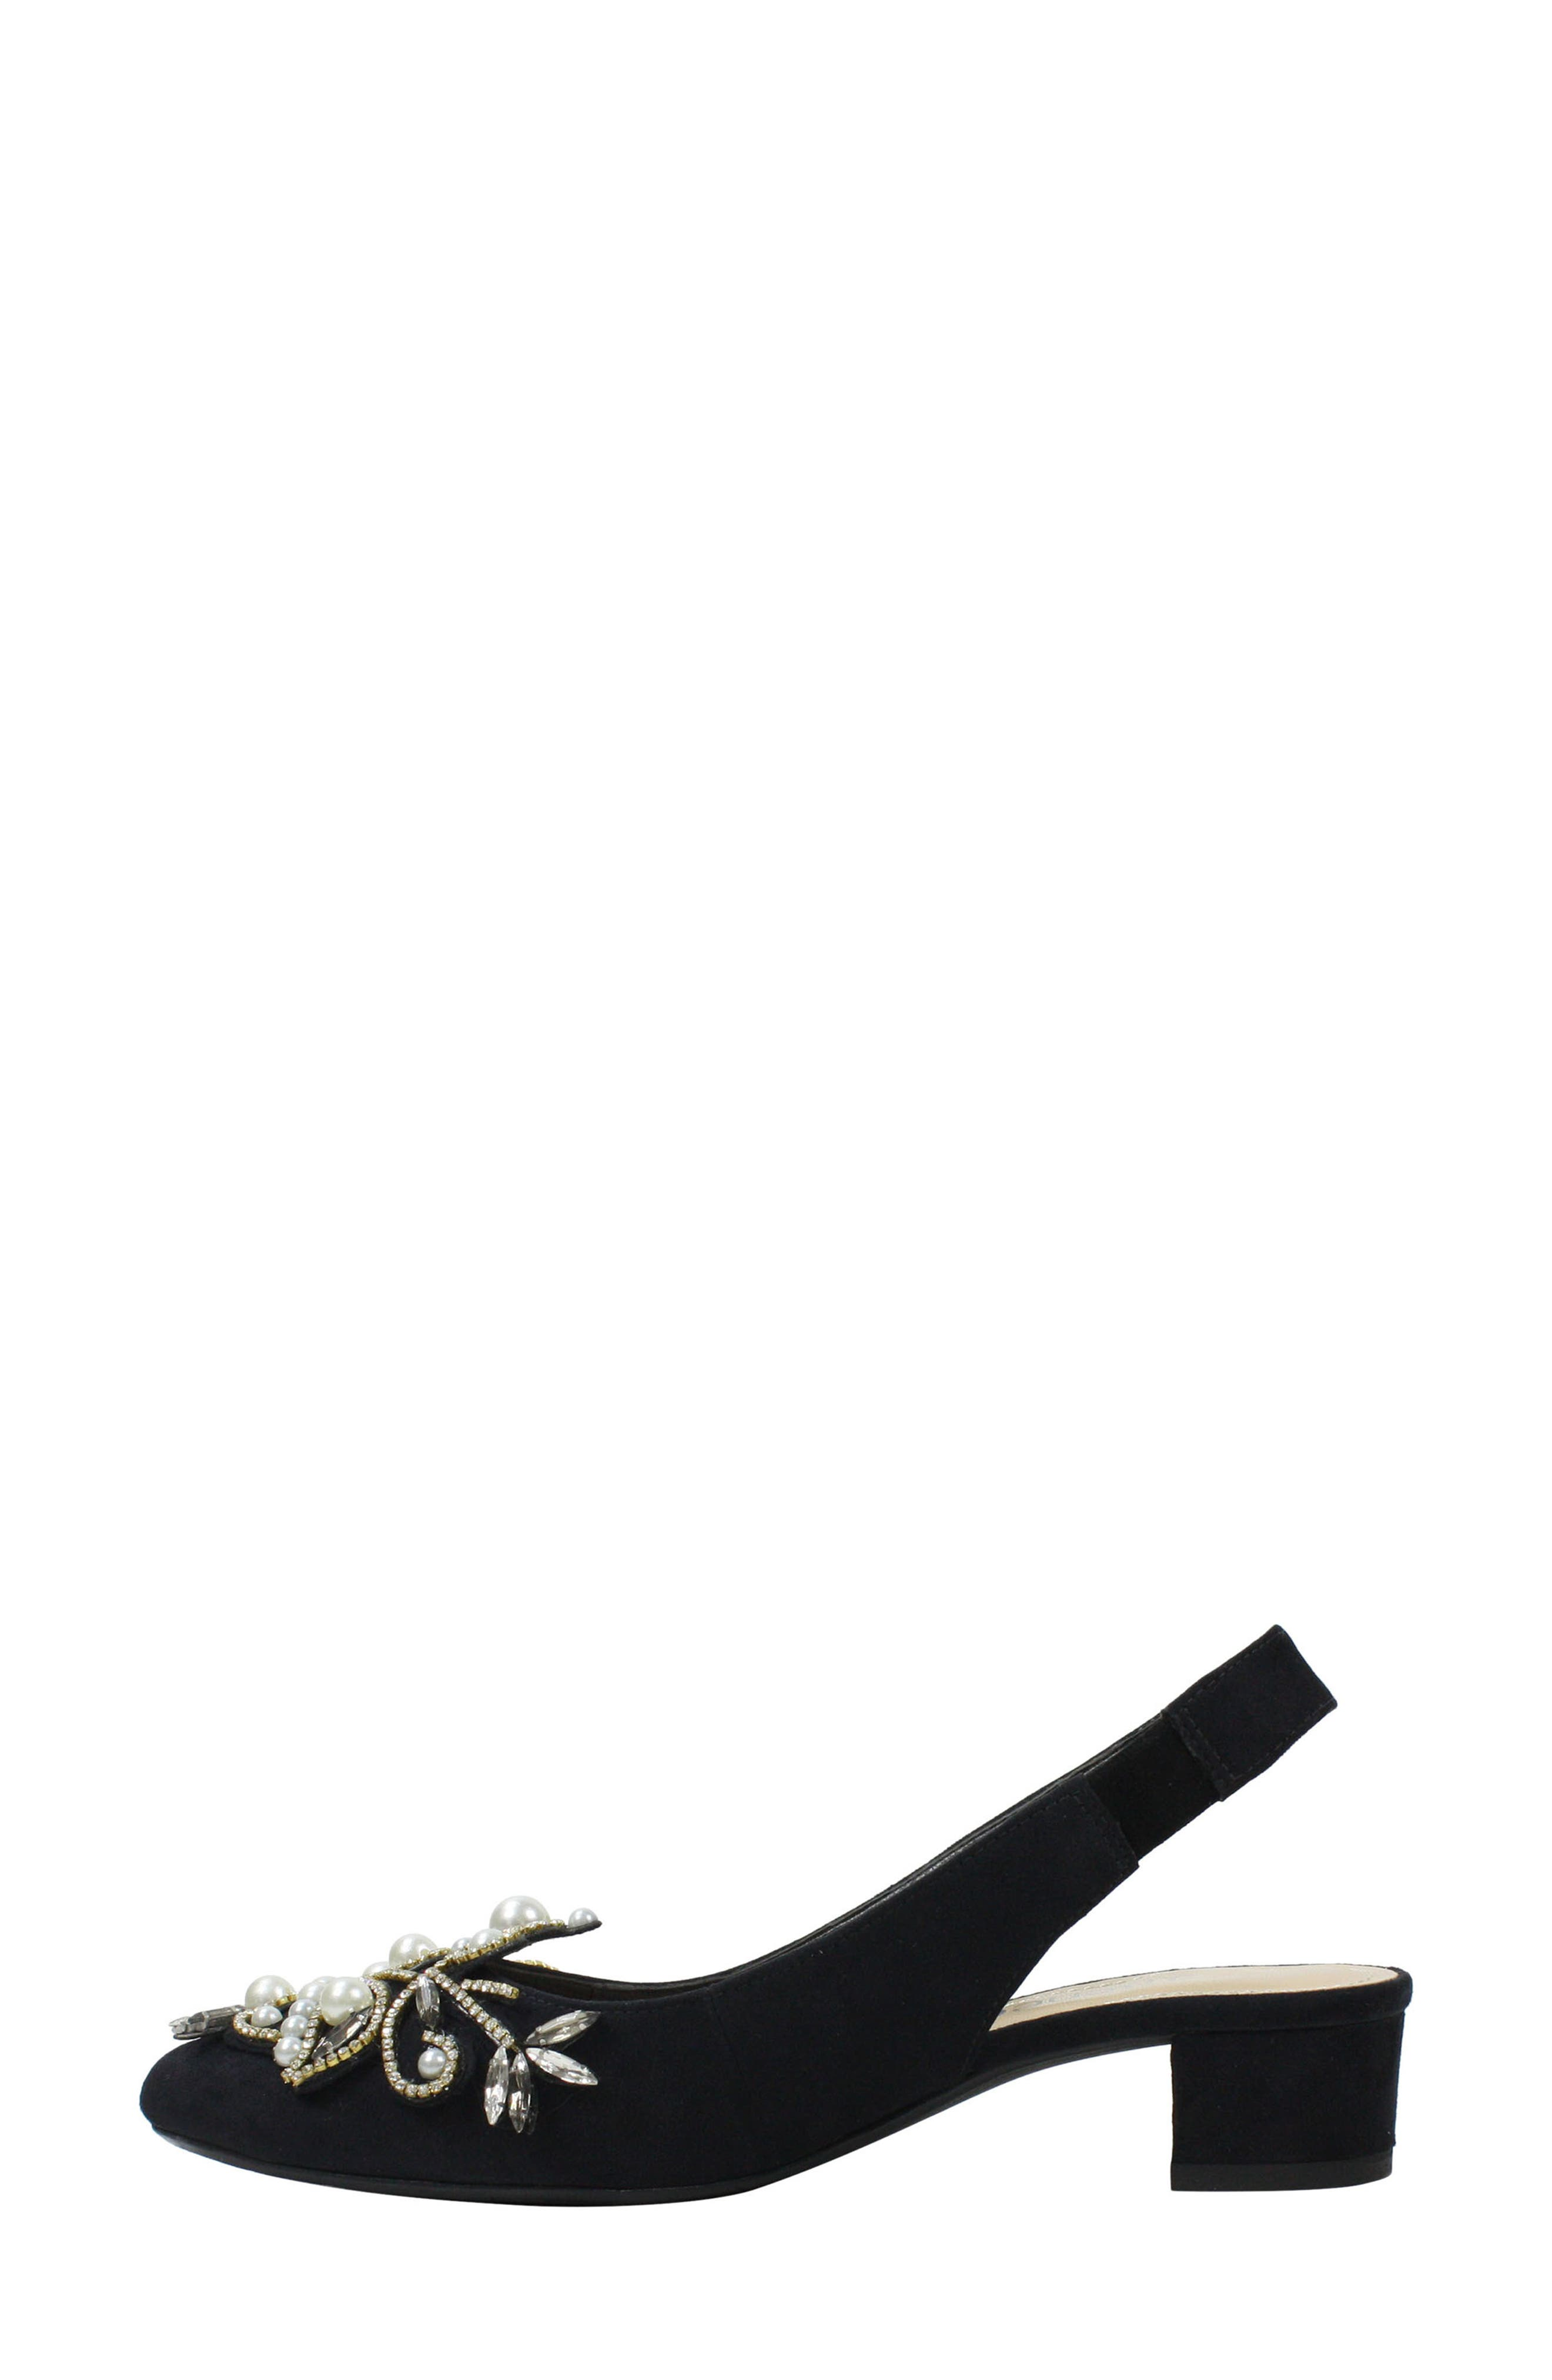 Delroy Embellished Slingback Pump,                             Alternate thumbnail 7, color,                             BLACK SUEDE/ WHITE PEARLS